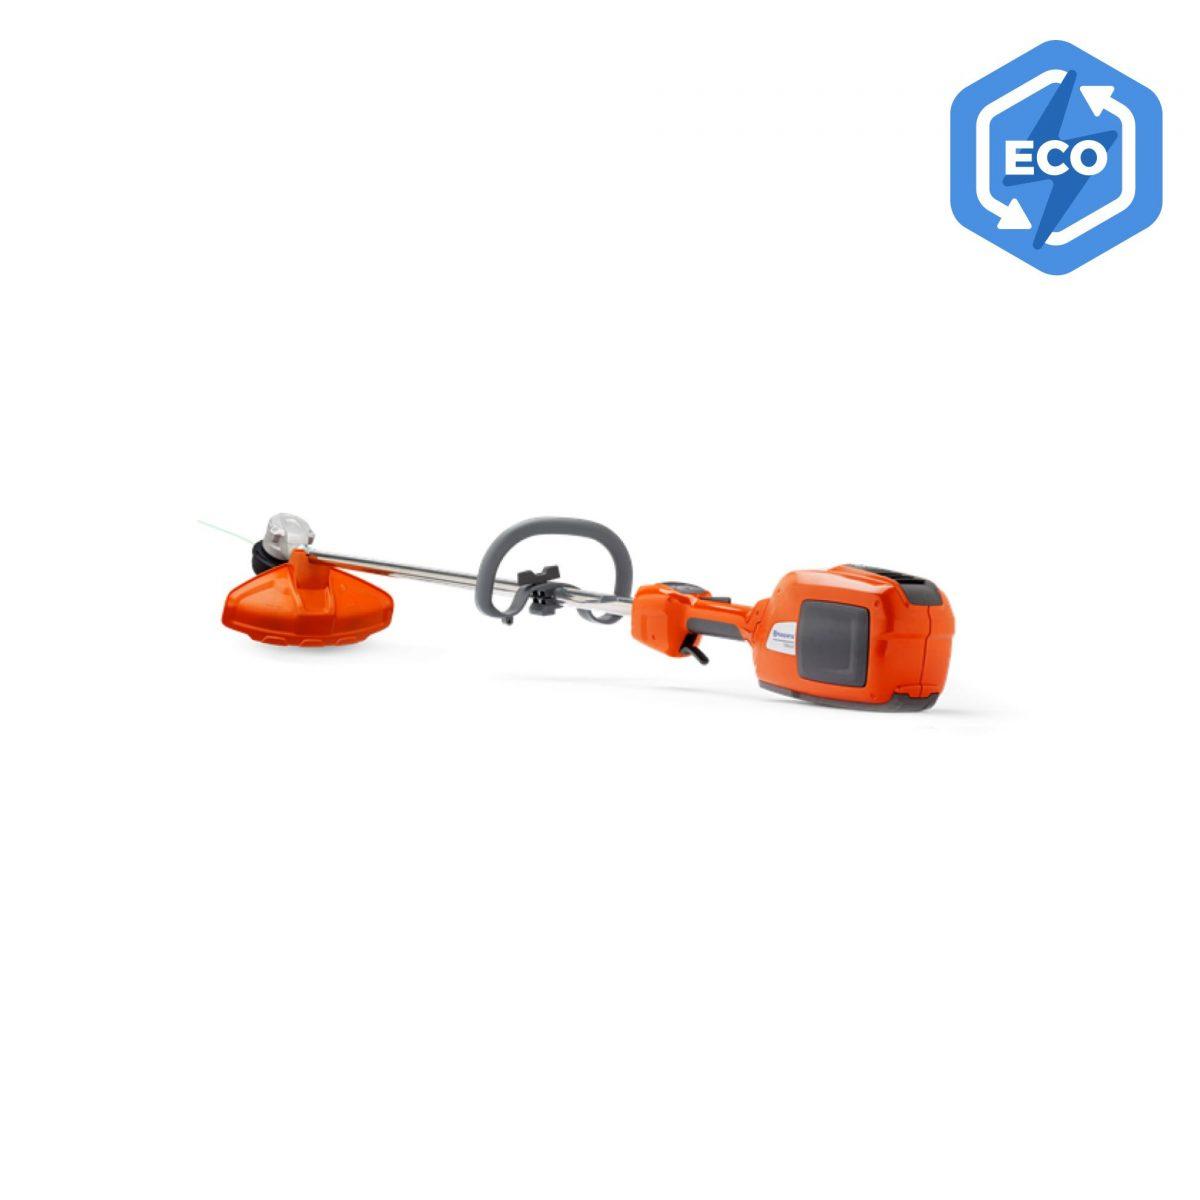 Husqvarna 536 LiLX Brushcutter